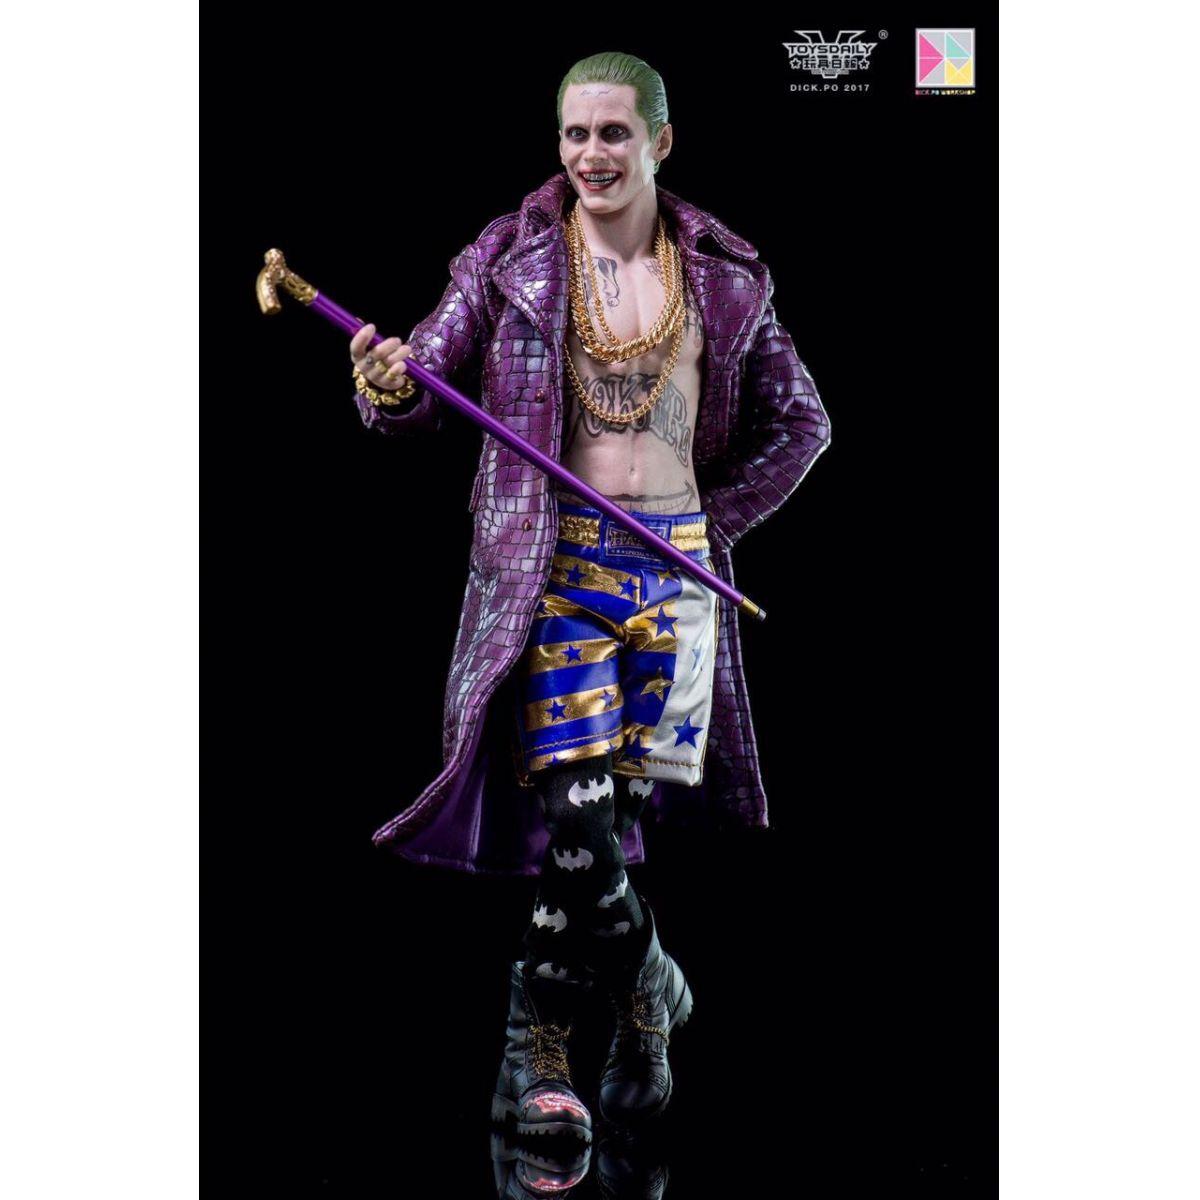 Suicide Squad The Joker Purple Coat Version  1/6 Hot Toys